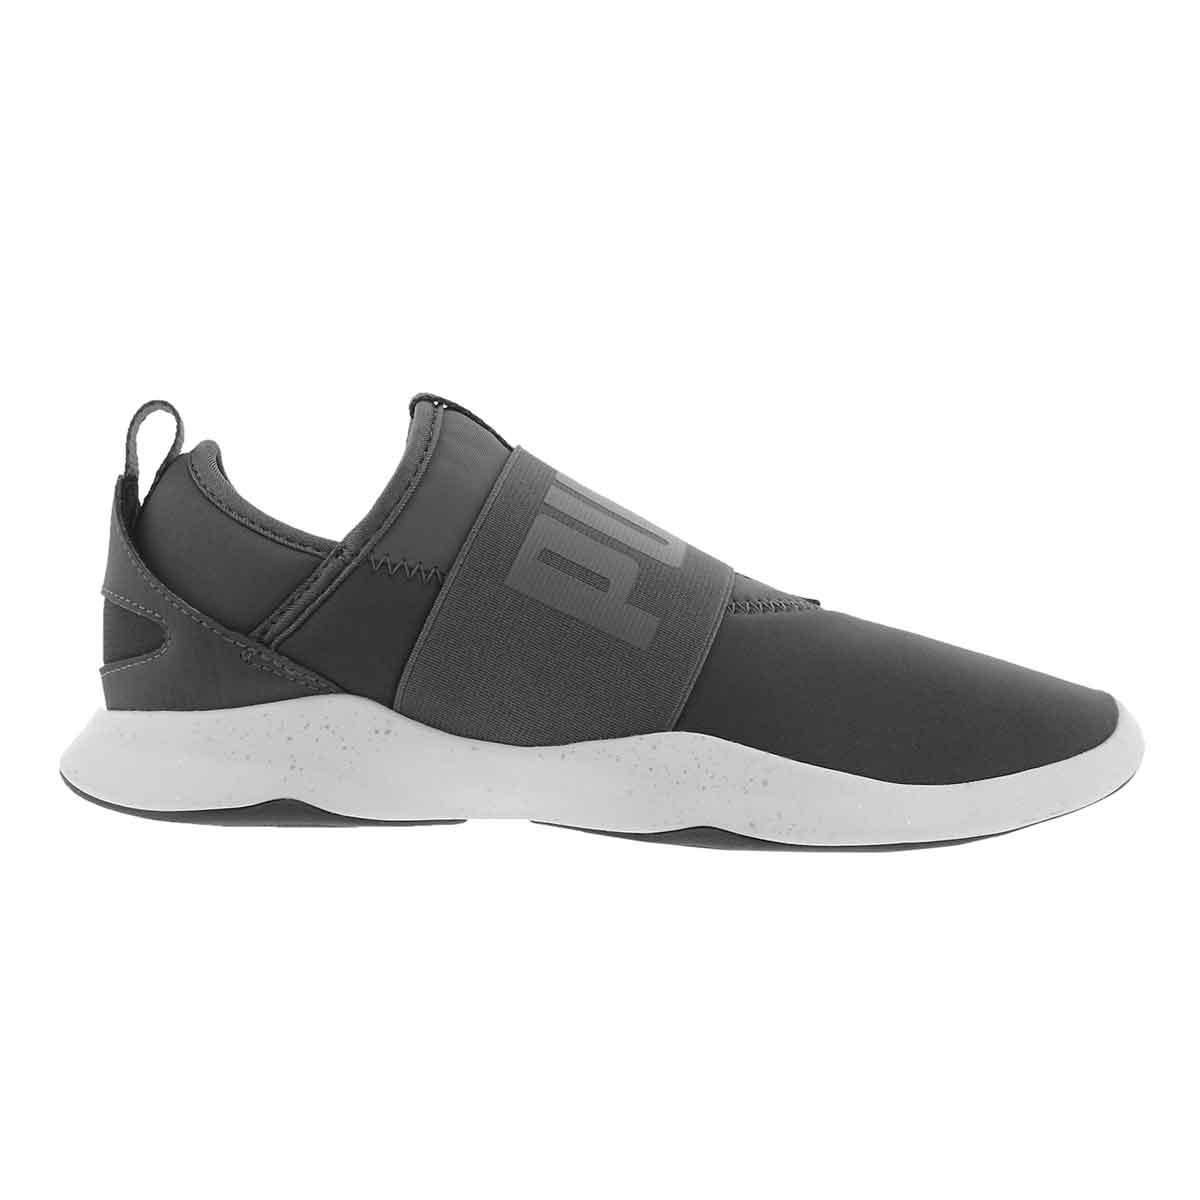 Lds Puma Dare Speckles asphalt sneaker